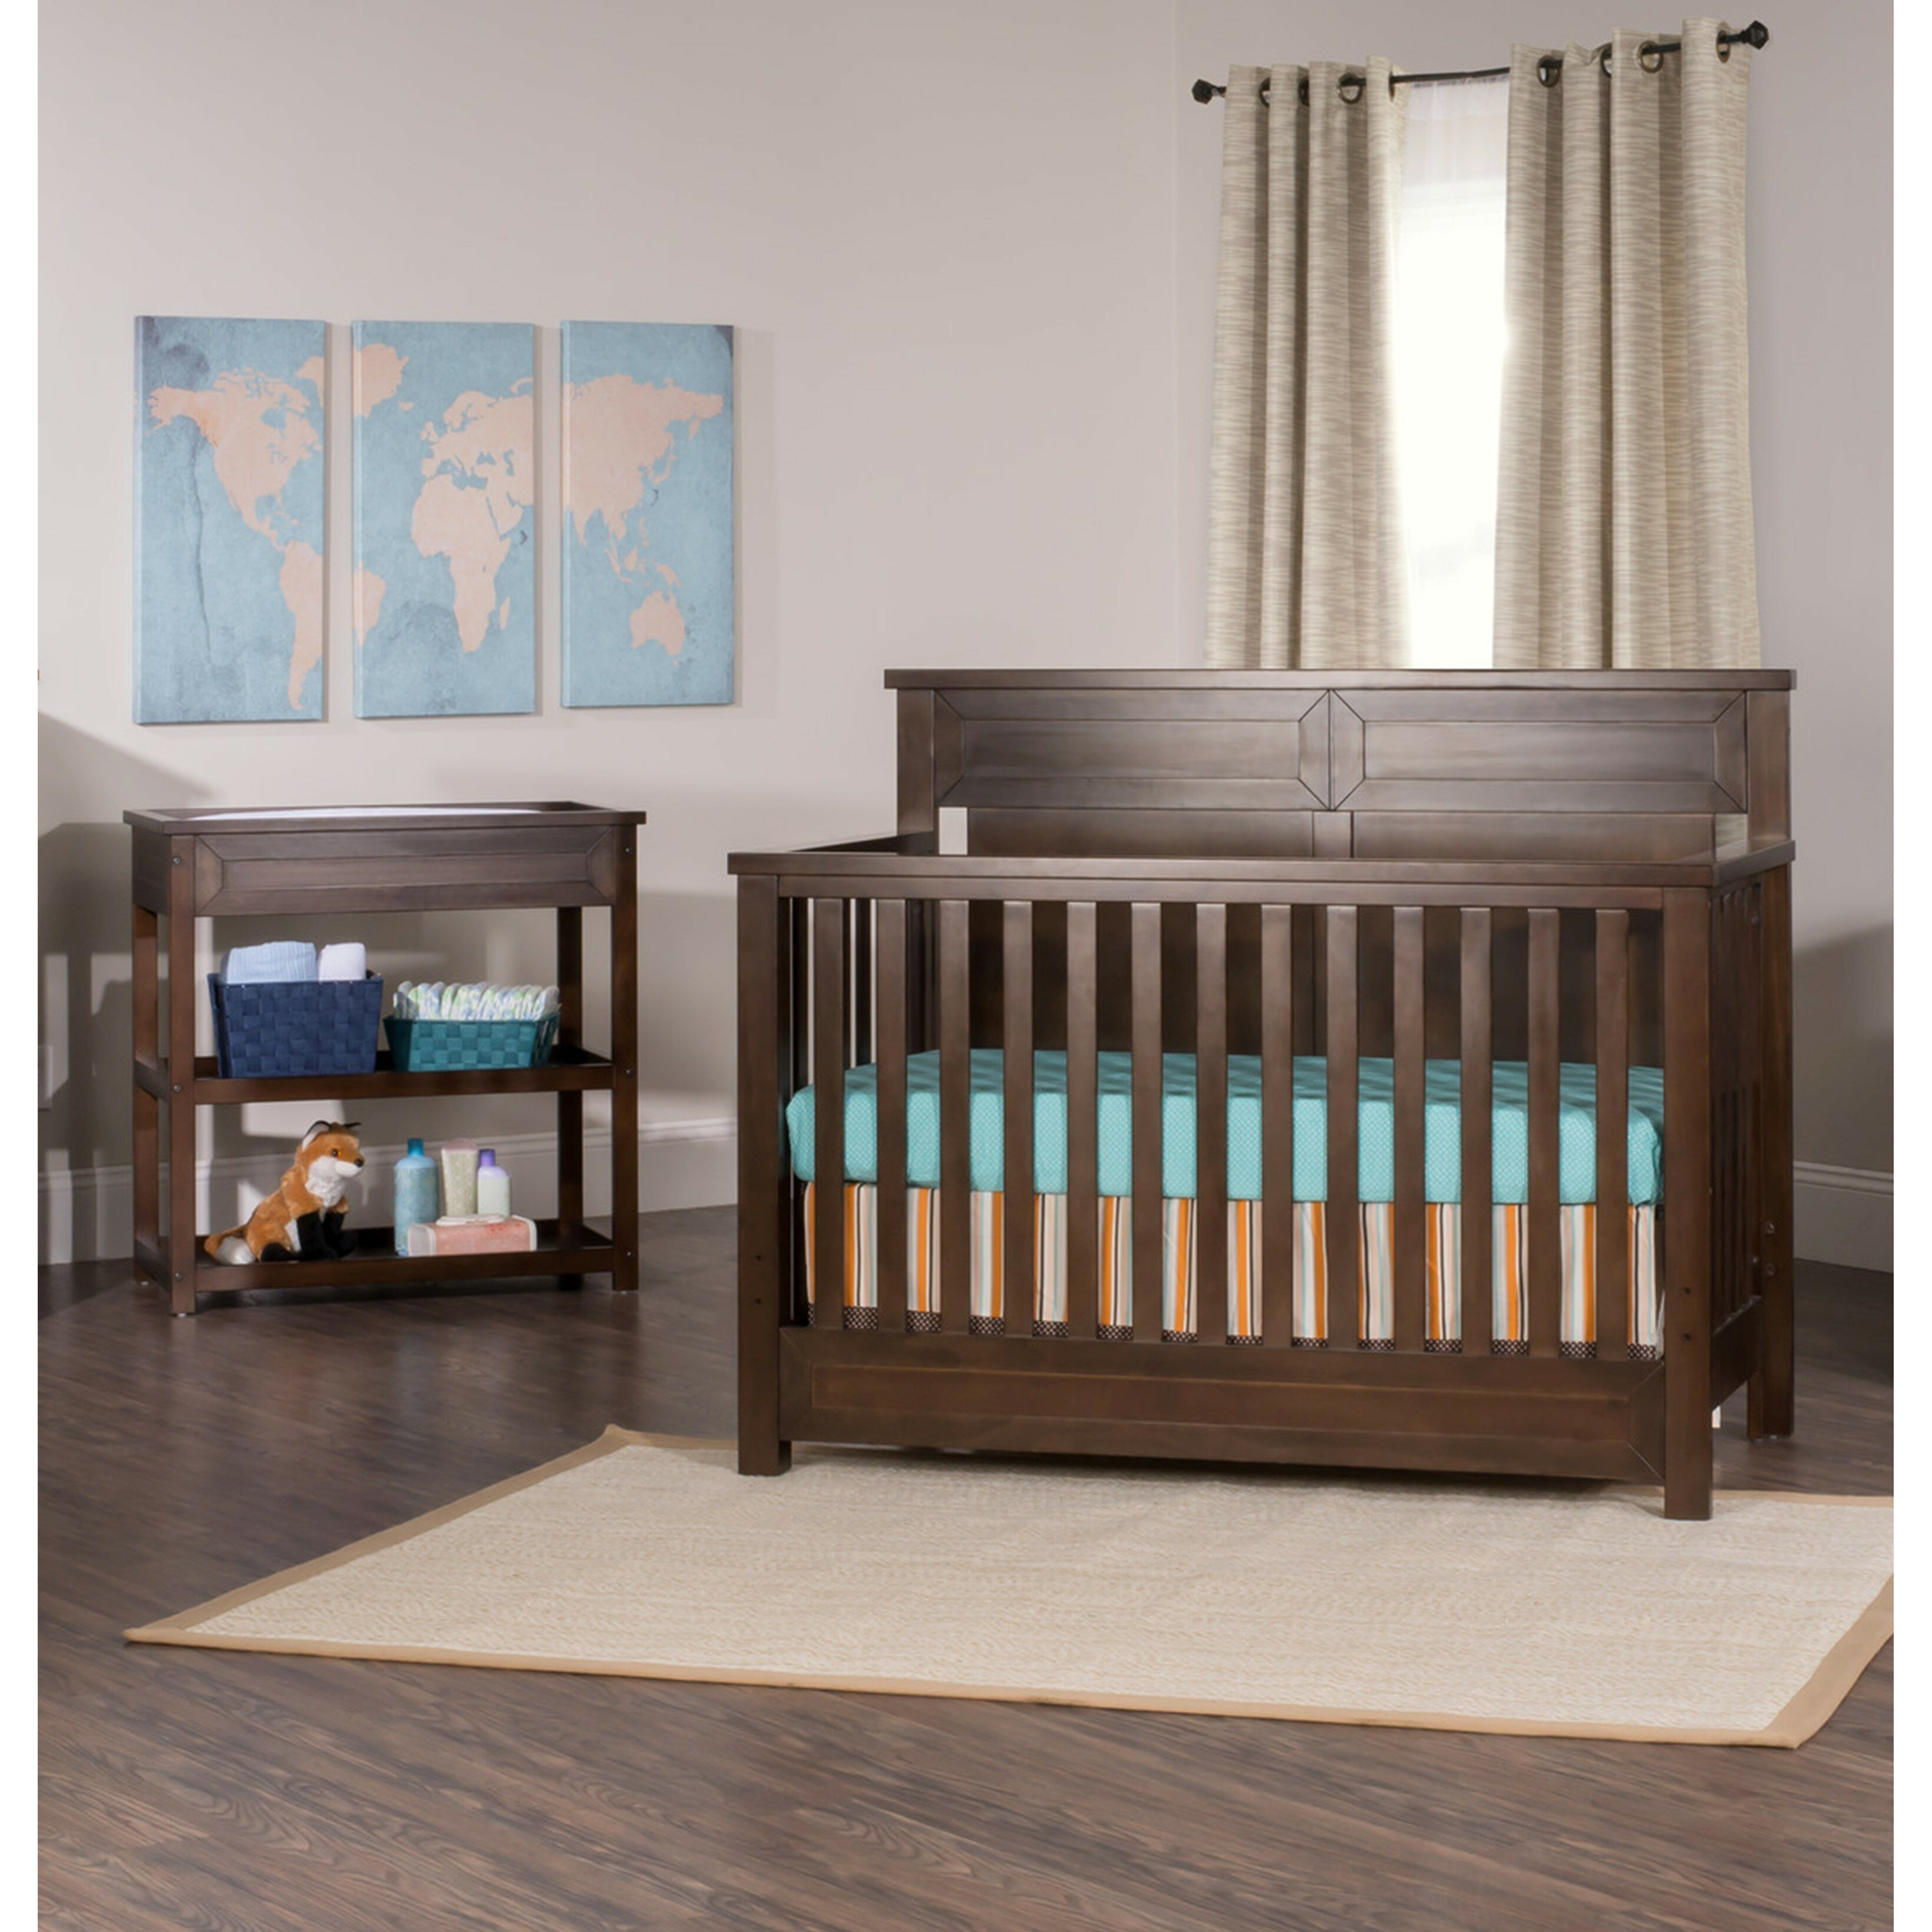 child craft convertible crib child craft camden 4 in 1. Black Bedroom Furniture Sets. Home Design Ideas